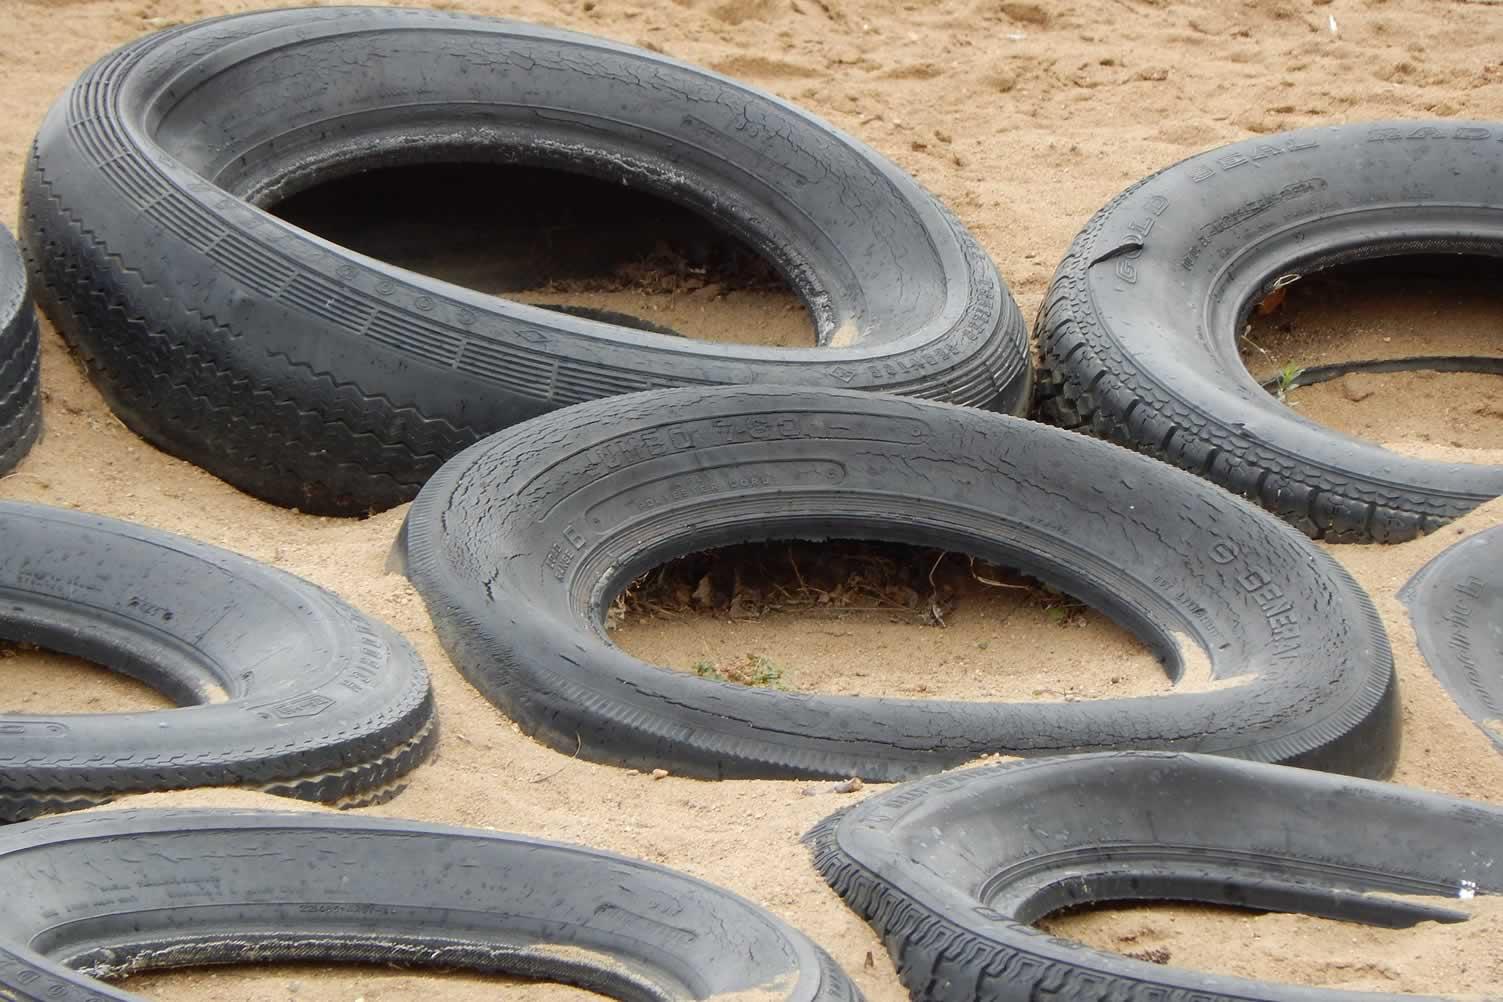 sandbox with tires